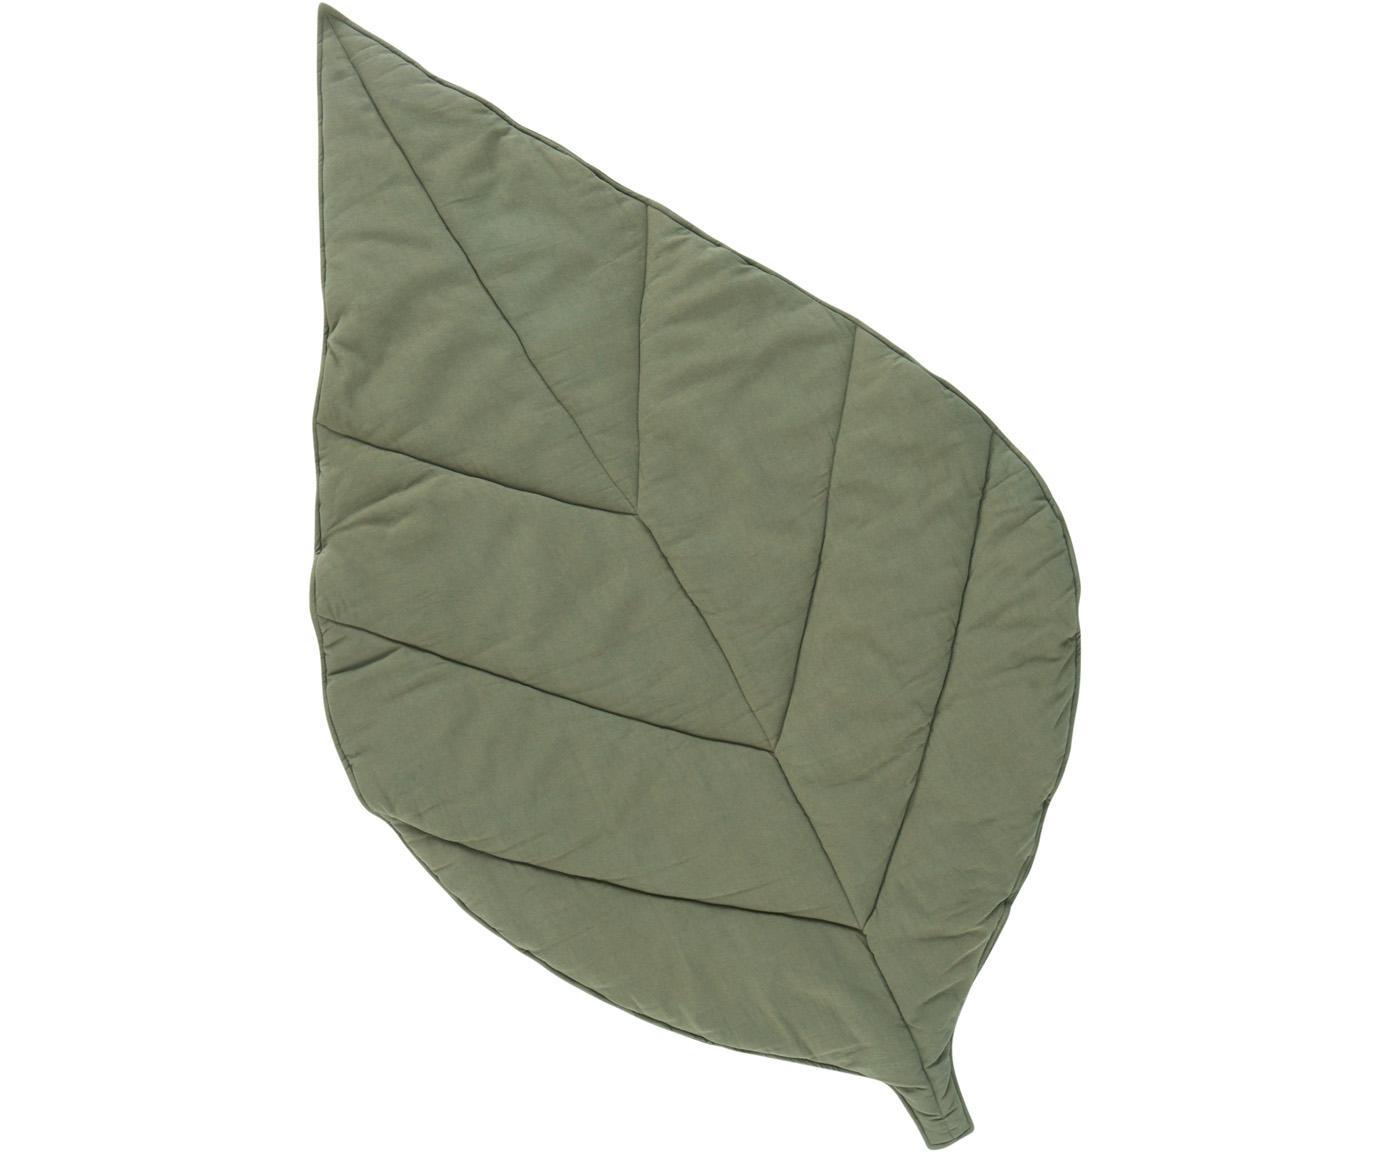 Speelmat Keaton, Bekleding: 100% biokatoen, Groen, 100 x 165 cm